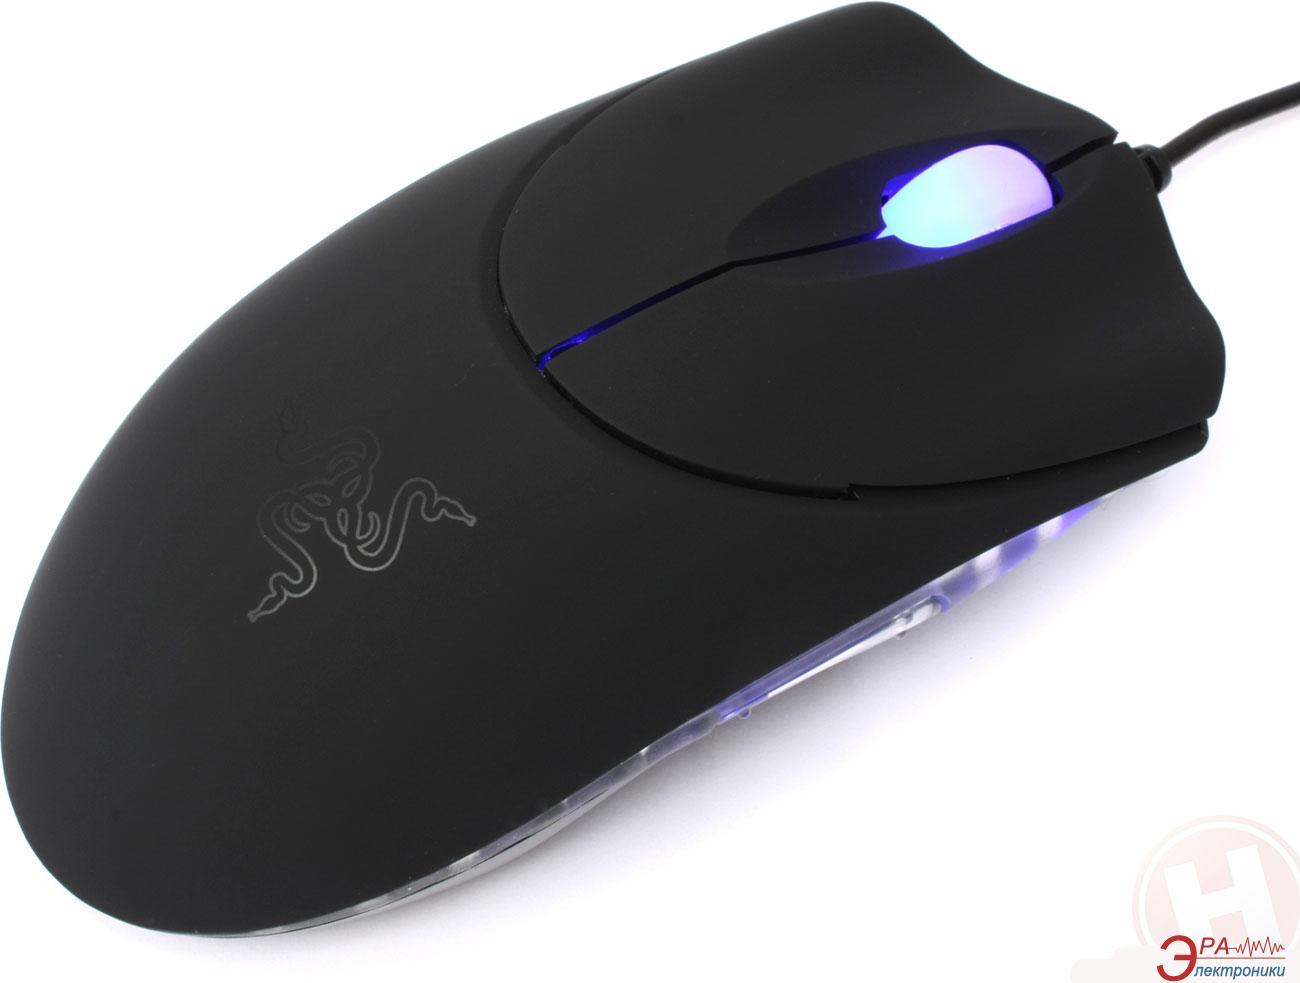 Игровая мышь Razer Diamondback 3G Frost (Diamondback) Blue